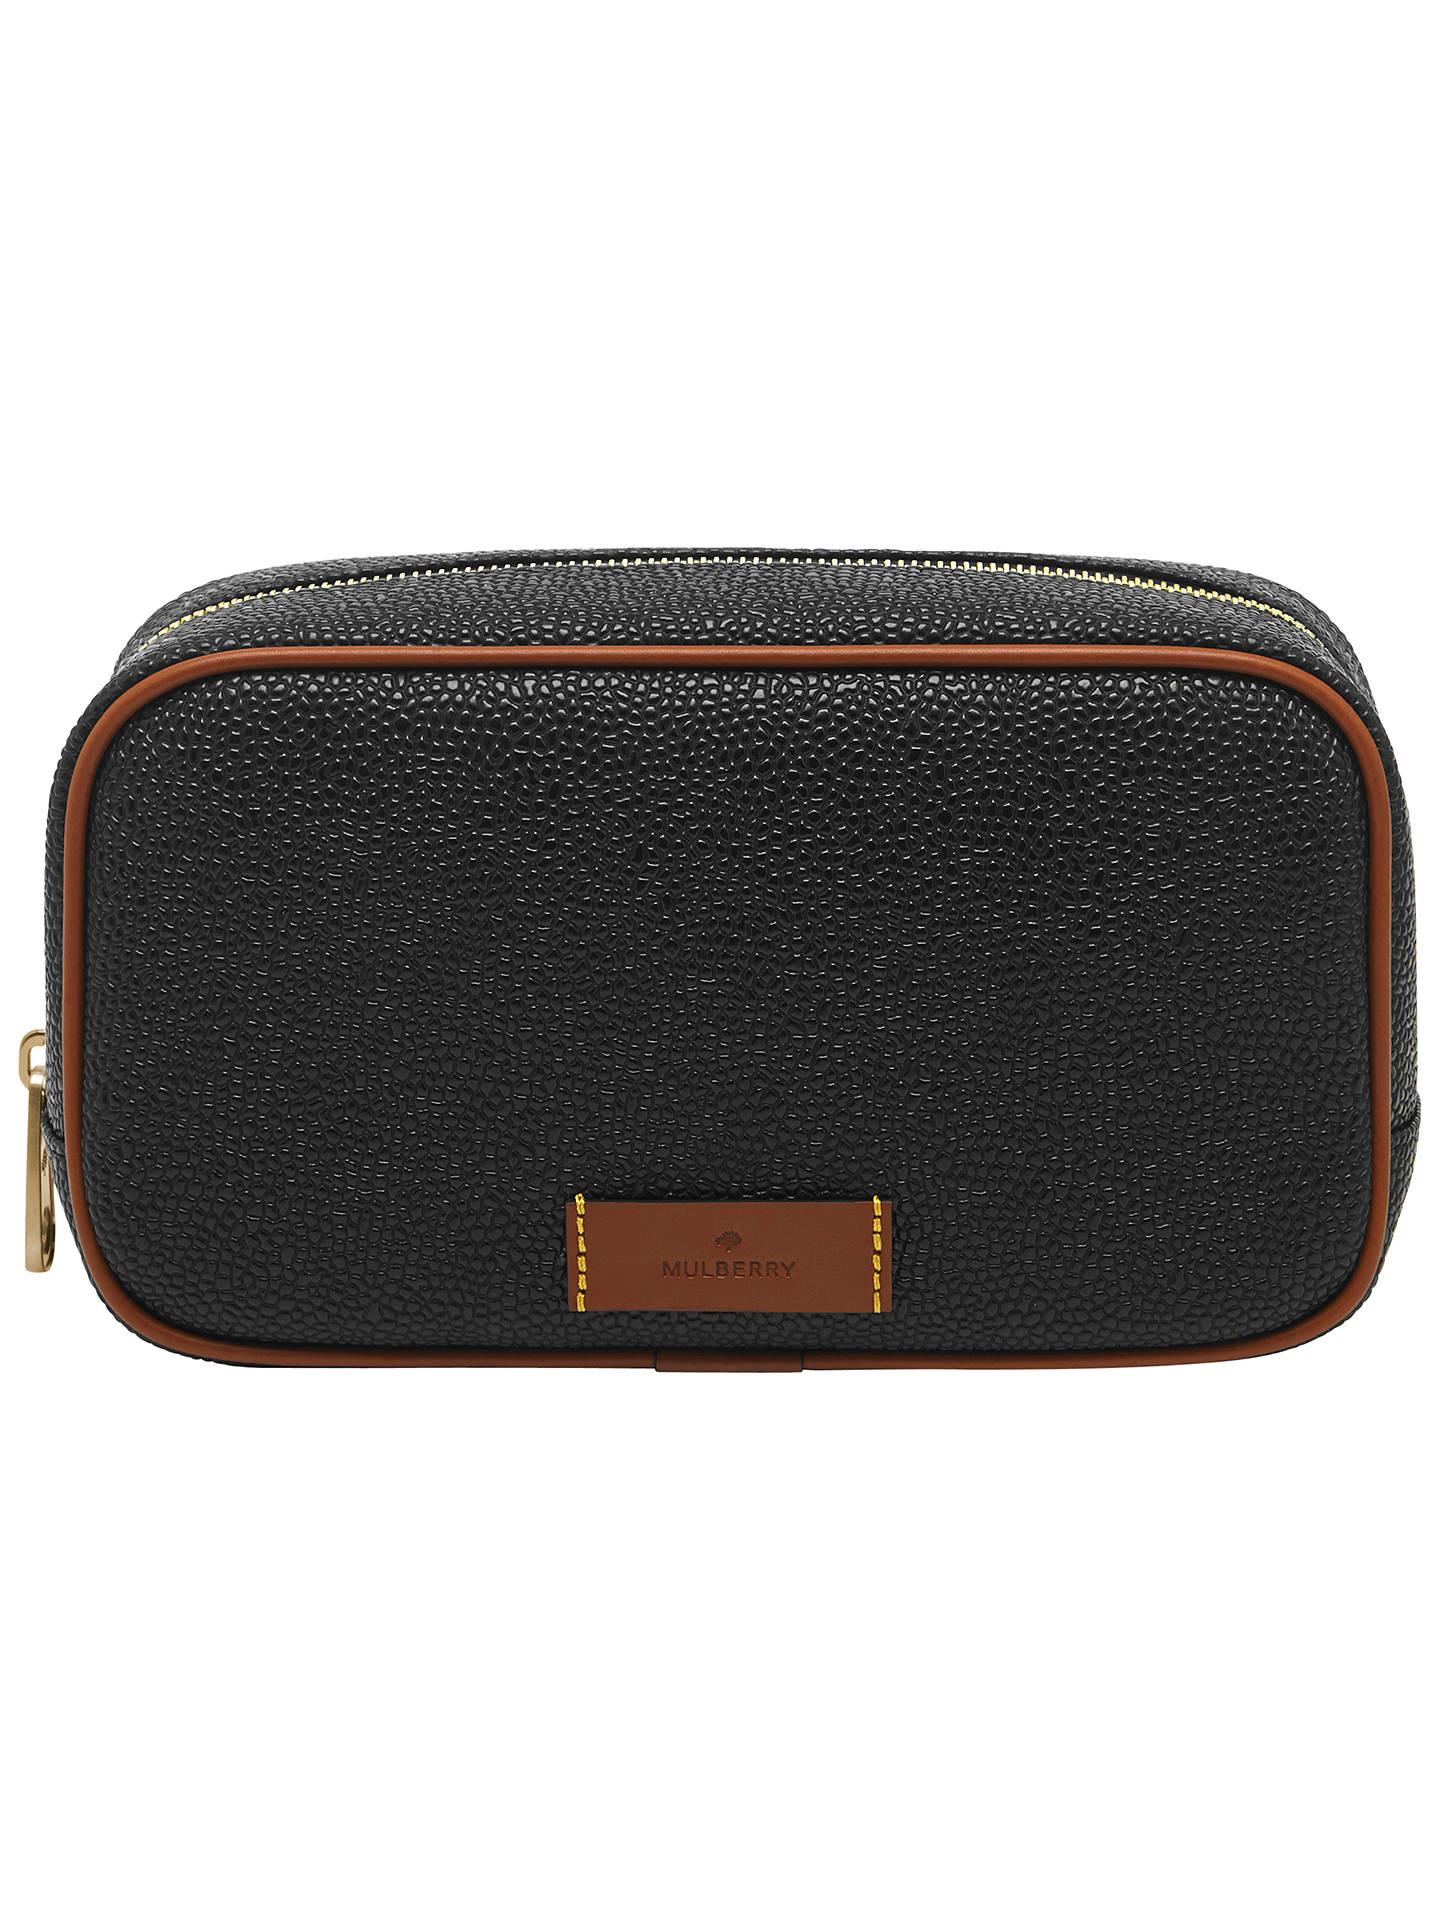 Mulberry Scotchgrain Leather Washbag Black Online At Johnlewis